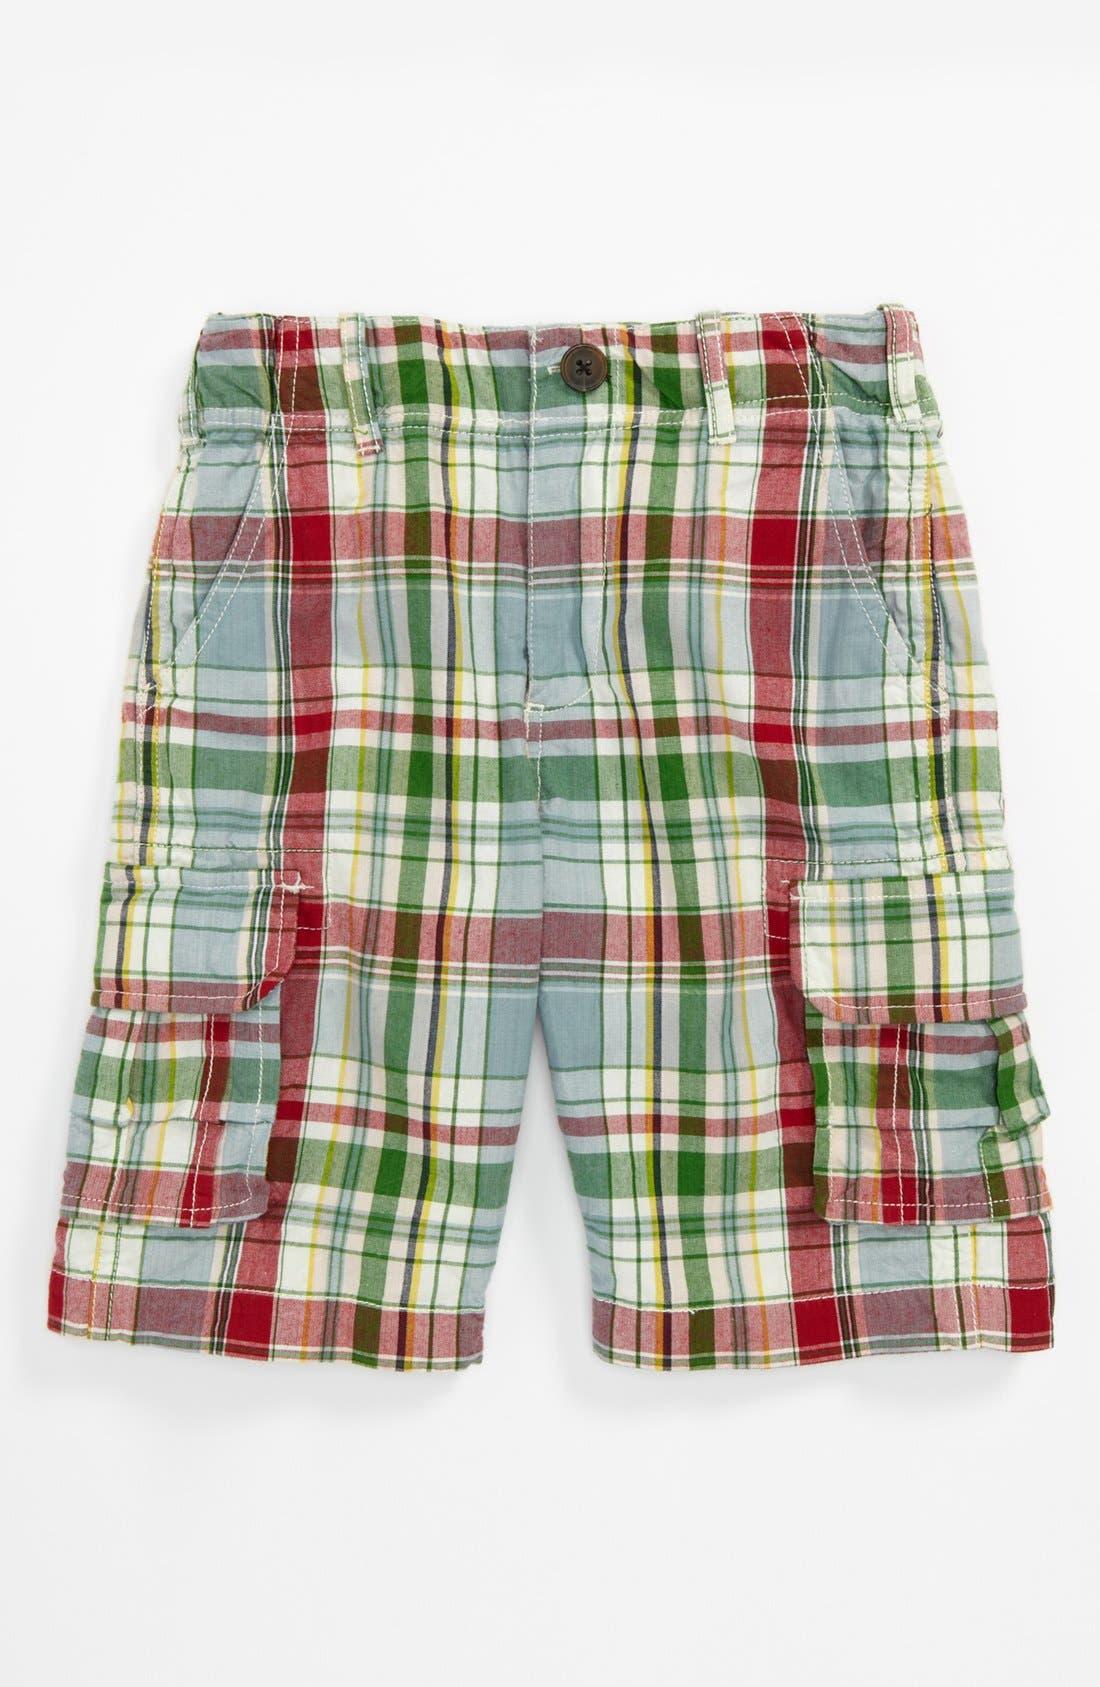 Main Image - Peek 'Lowell' Trail Shorts (Big Boys)